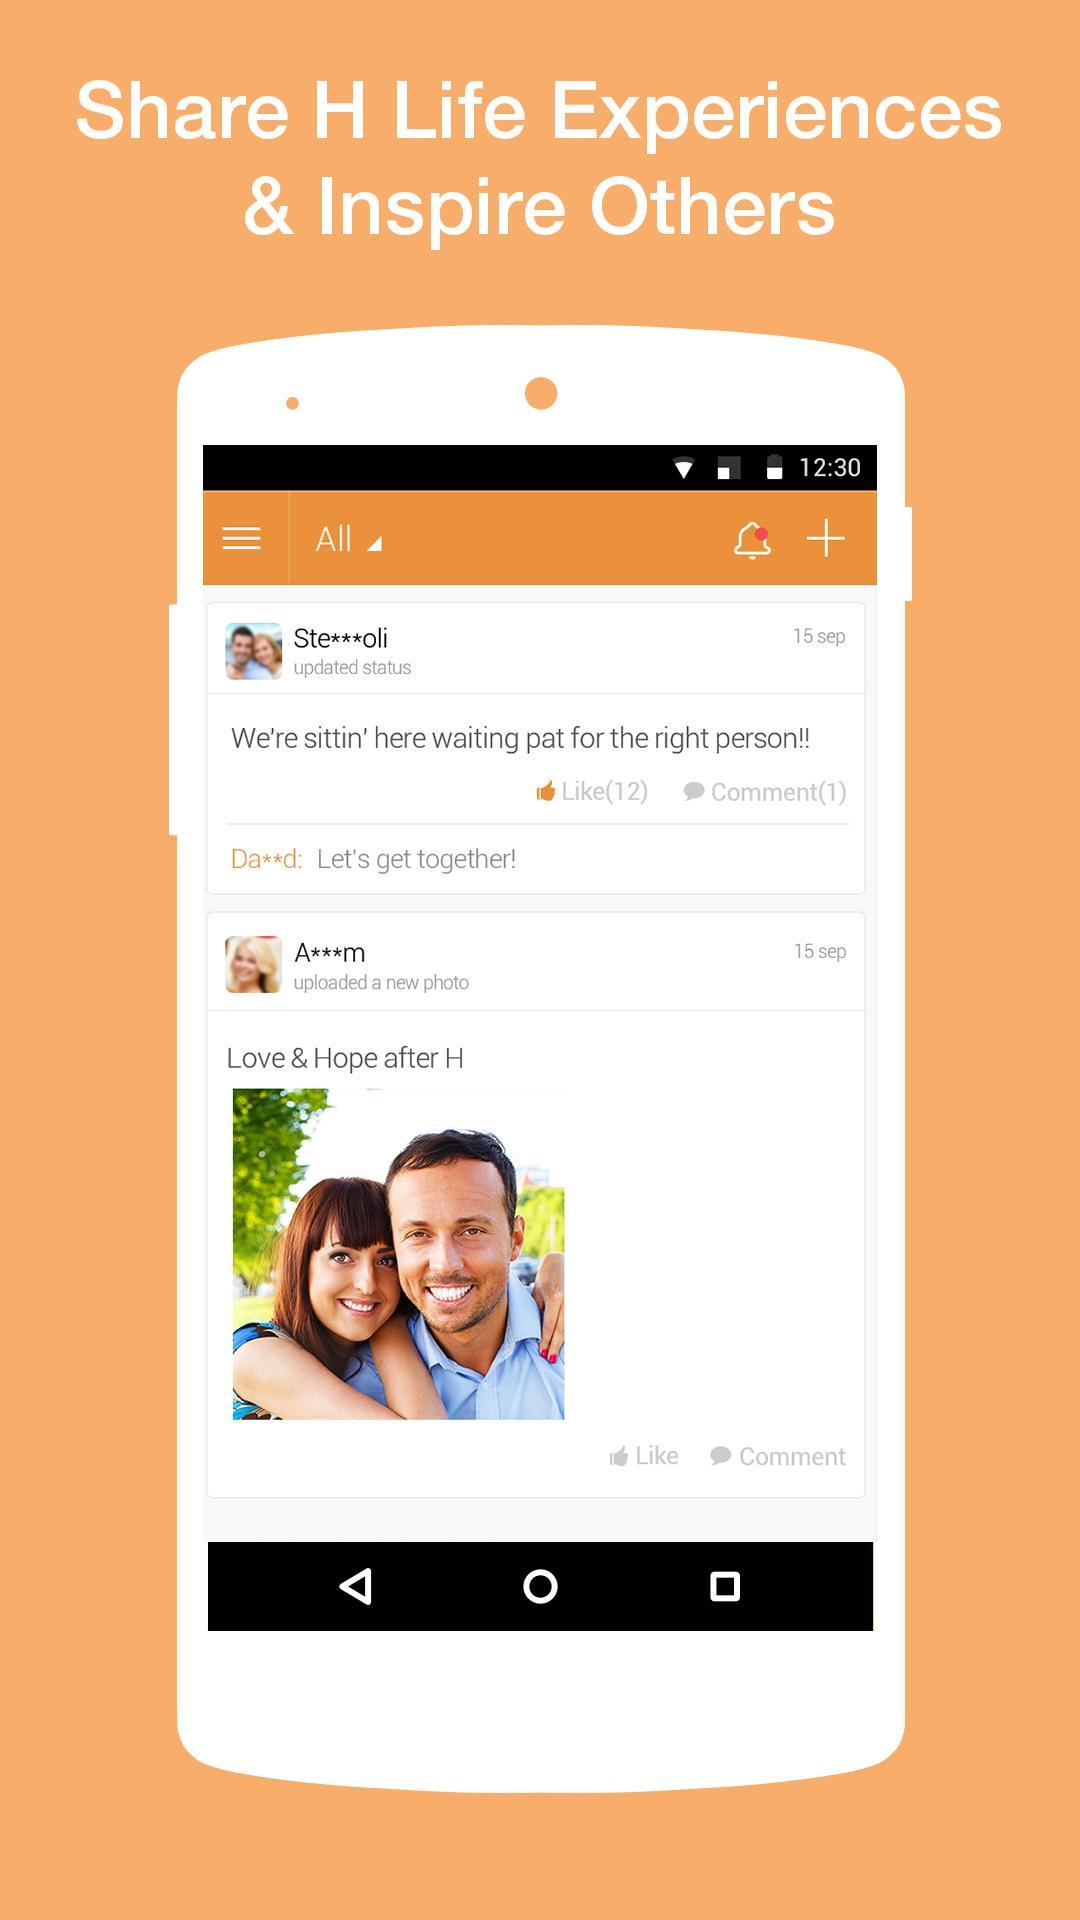 paras herpes dating appsLiitä resurssi keskus